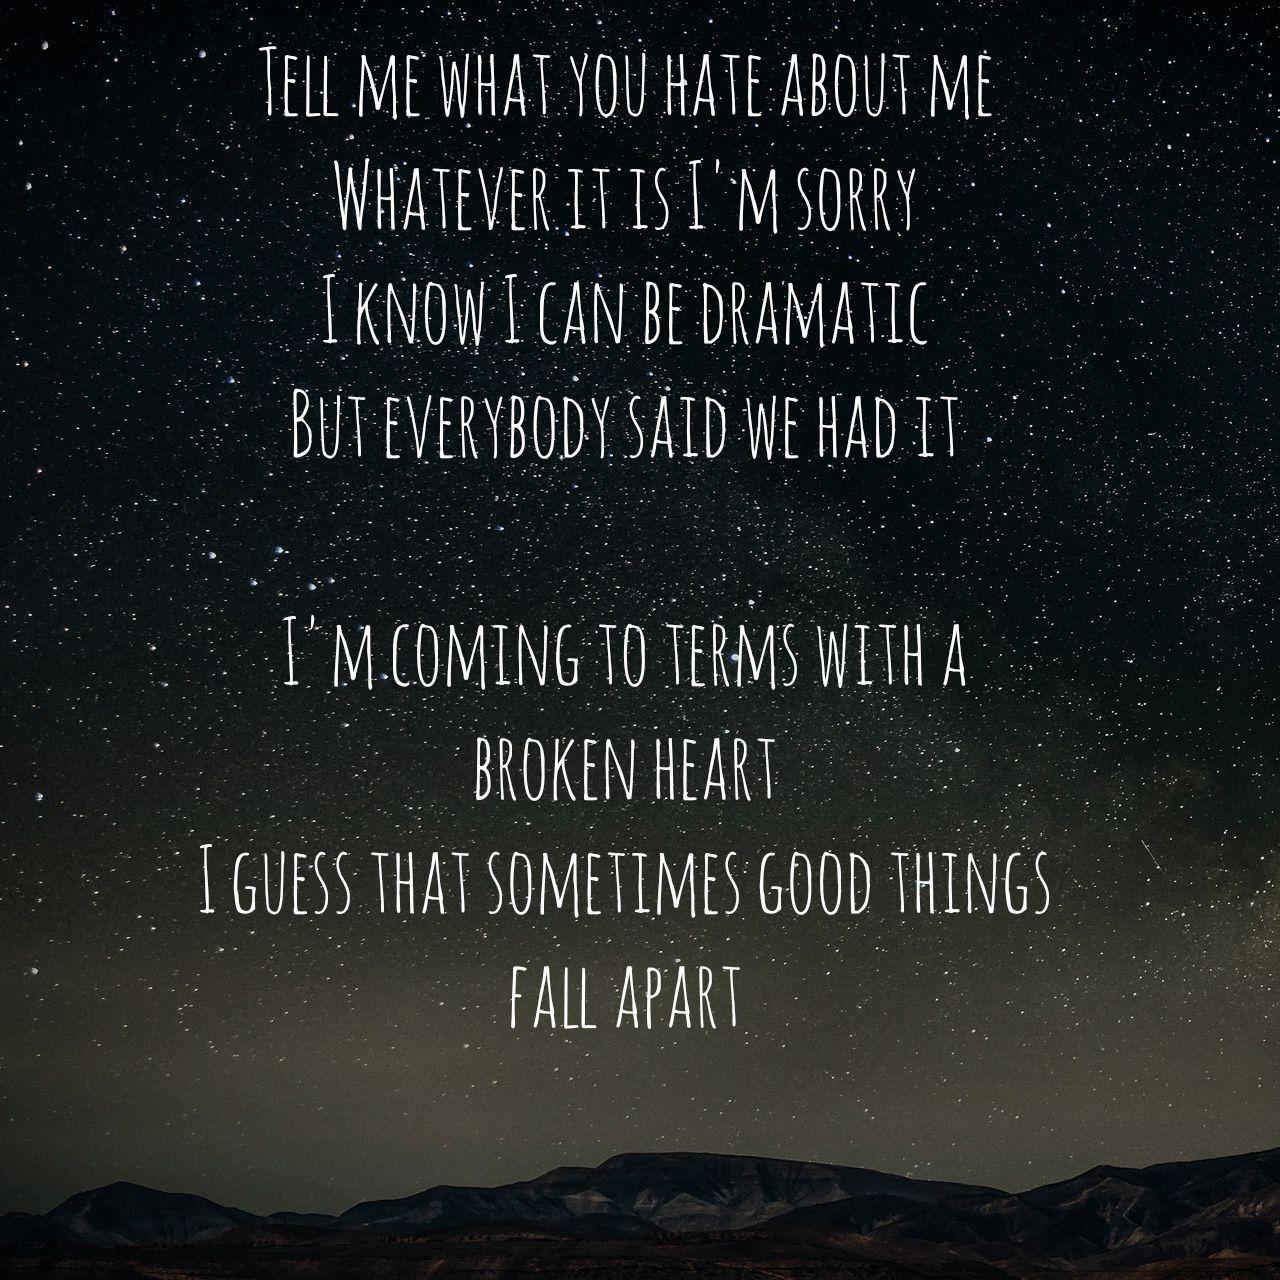 Good Things Fall Apart By Jon Bellion Lyrics